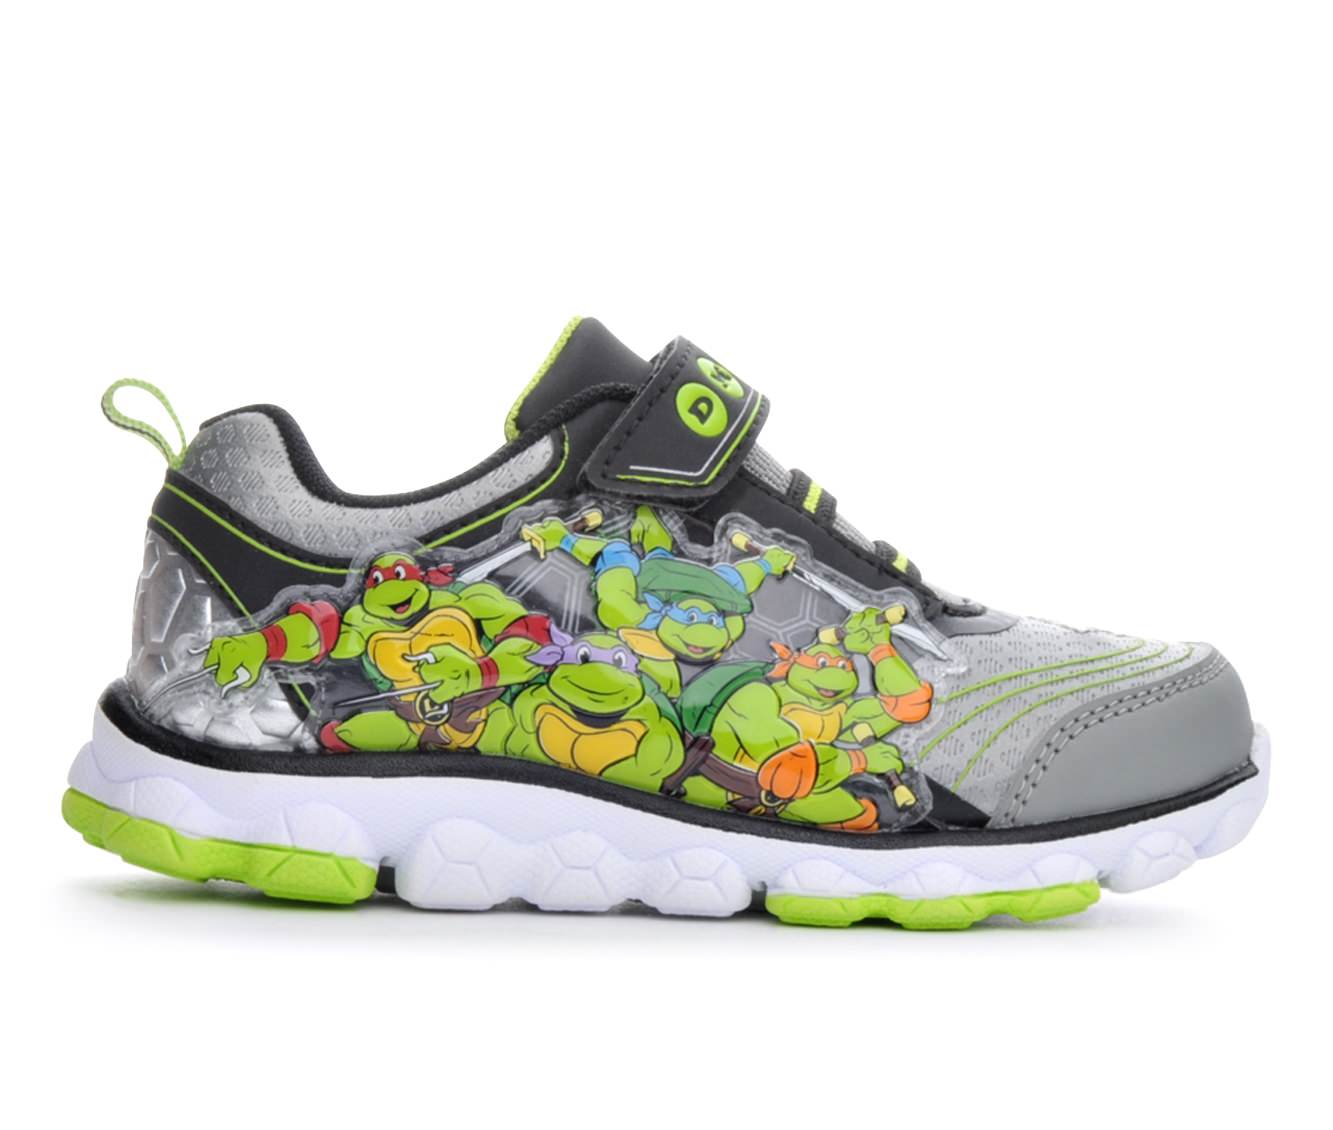 Boys' Nickelodeon TMNT DMRL Sneakers (Multicolor - Size 11 - Little Kid) 1619500